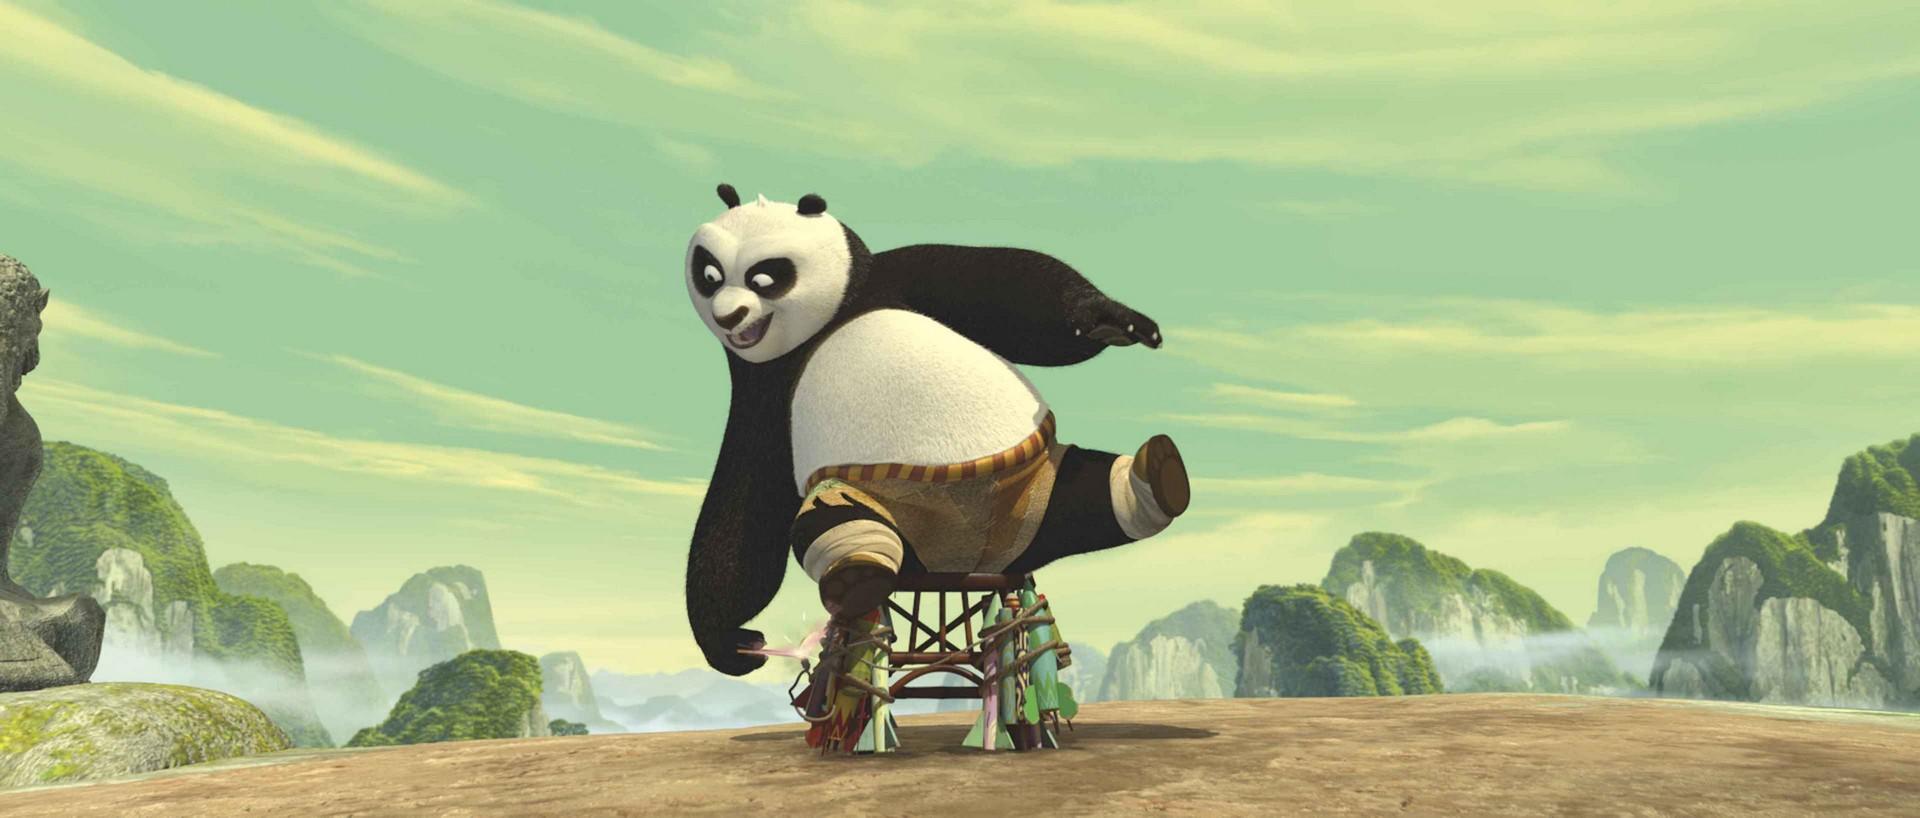 Кунг-фу Панда, кадр № 19